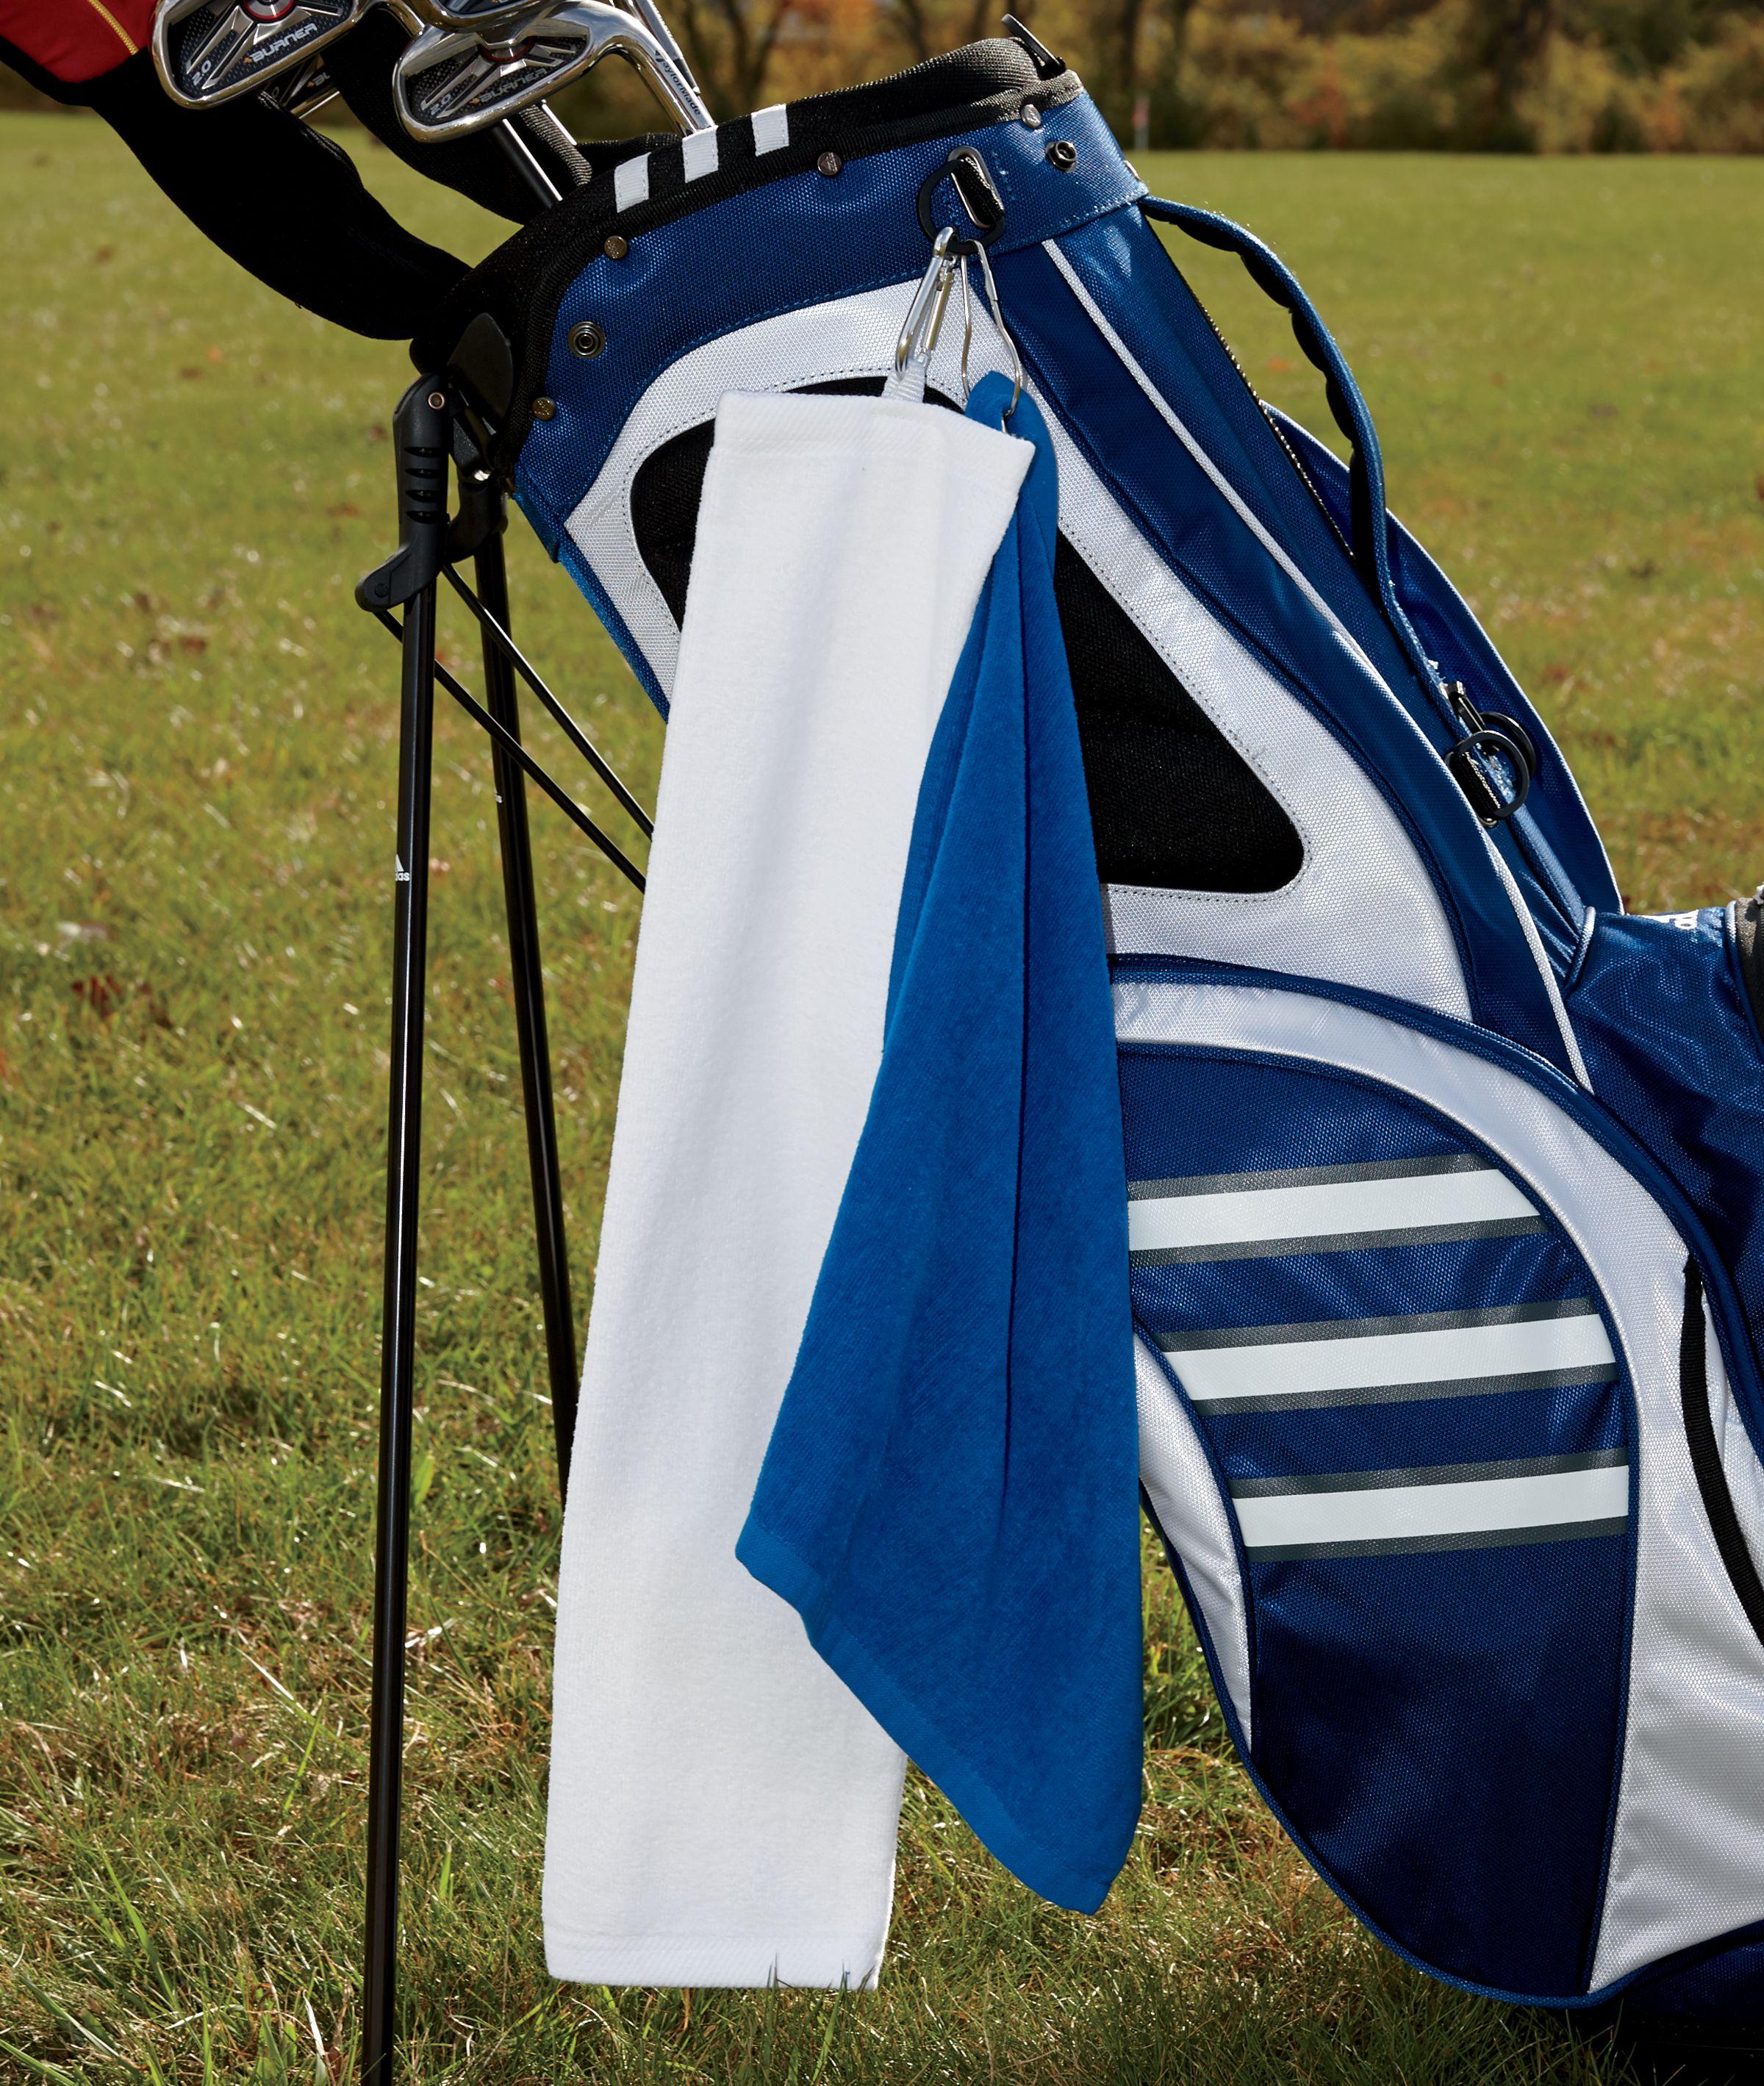 Ultraclub Golf Towels C1624c C1518gh Items Pinterest Microfiber Towel Standard